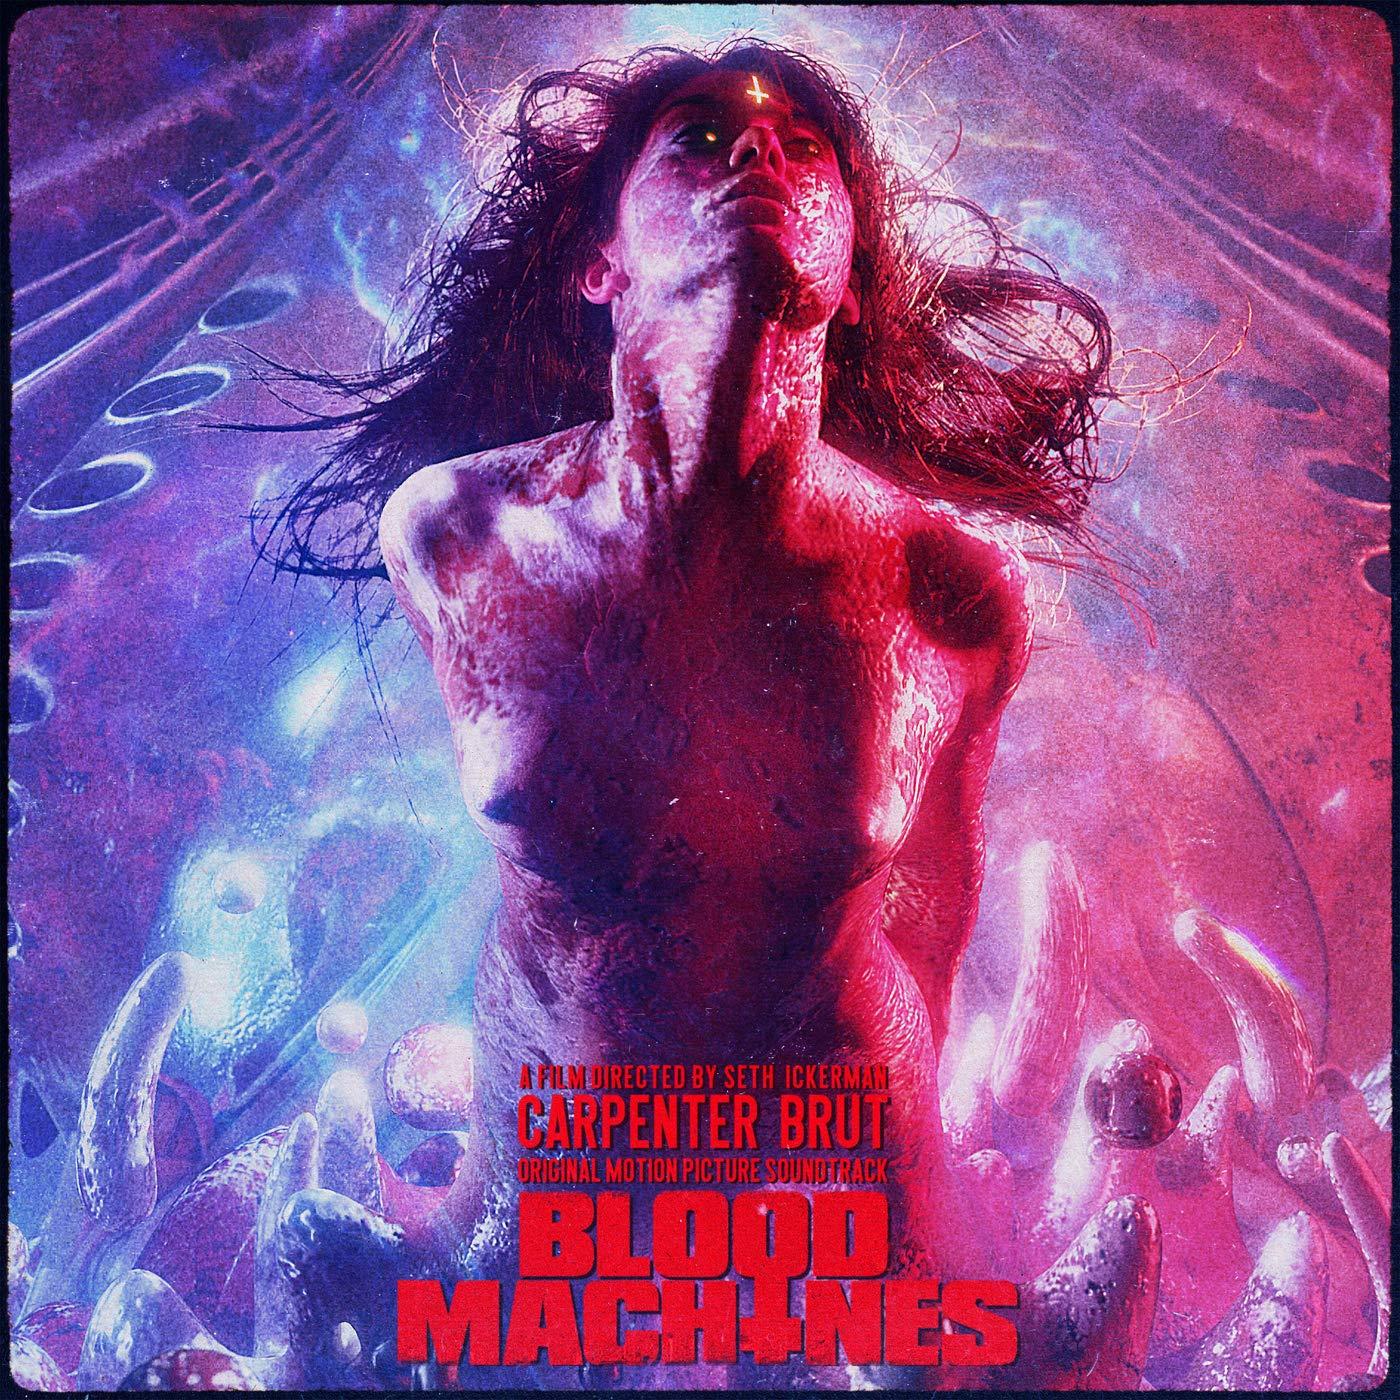 Carpenter Brut - Blood Machines (2020) [FLAC] Download